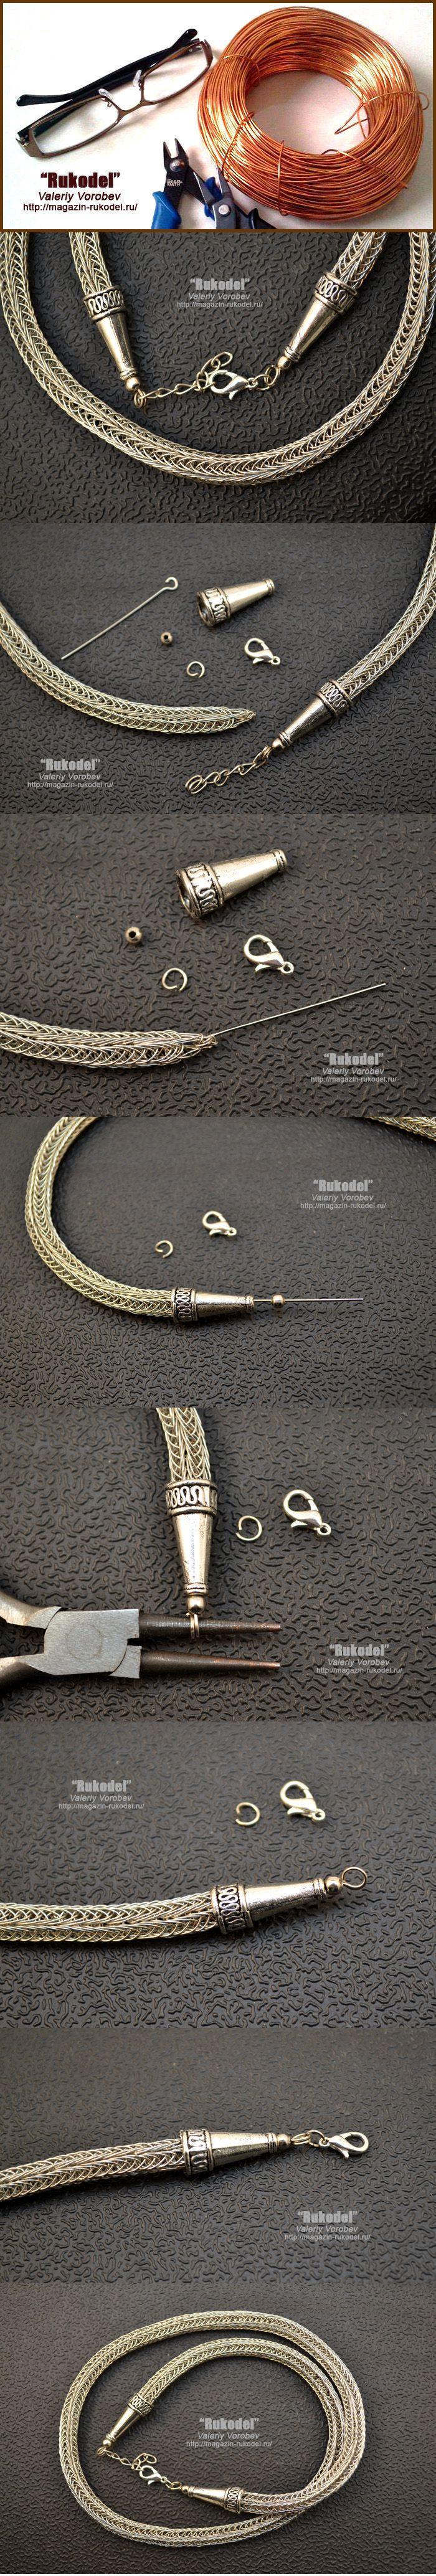 Viking Knit - Tip Crimp End -  http://magazin-rukodel.ru/